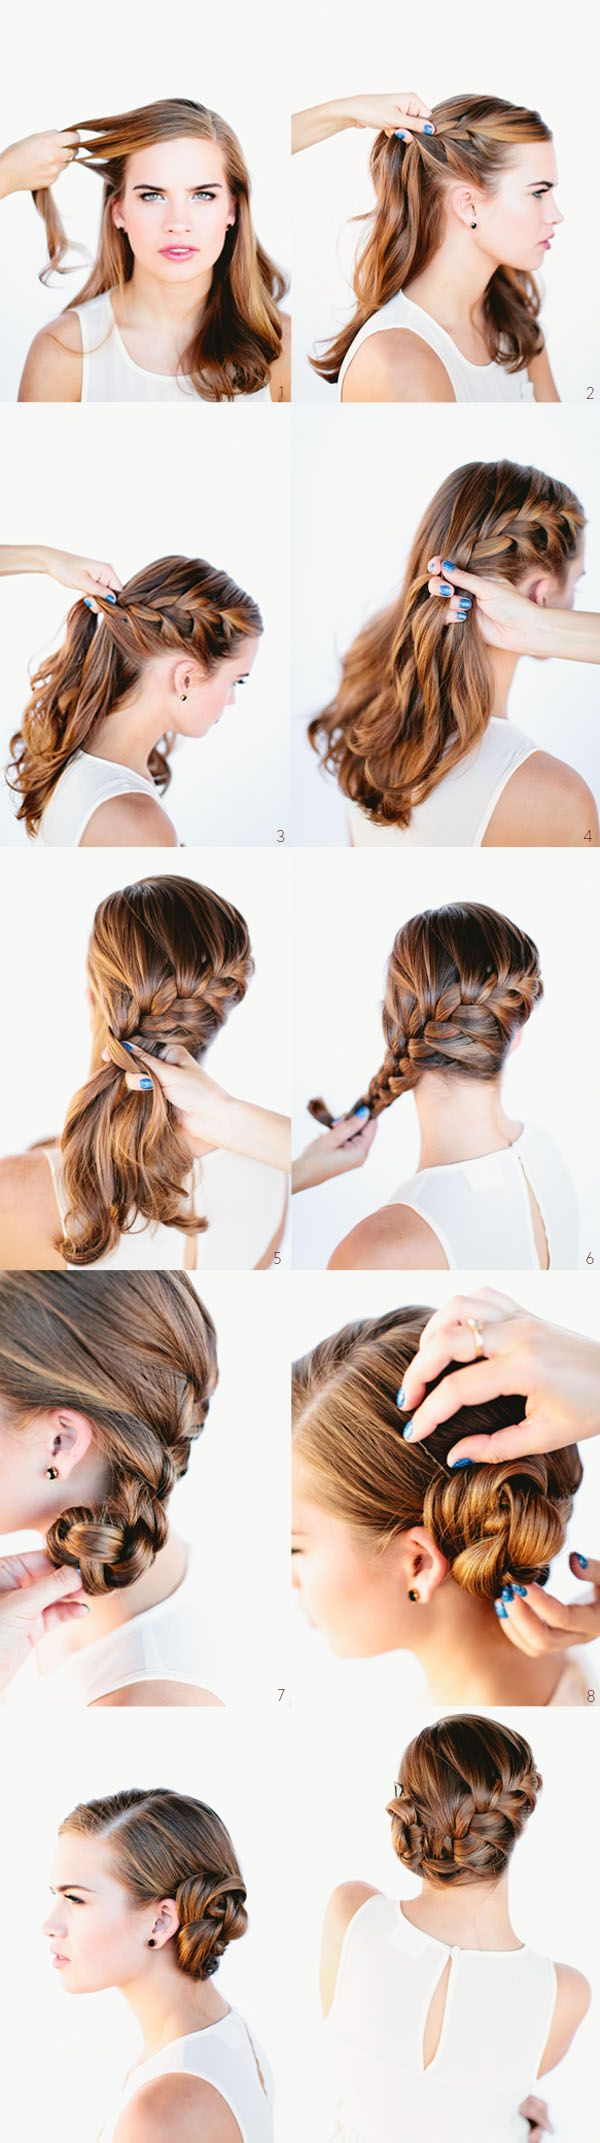 194 best HAIR IDEAS images on Pinterest | Hairstyle ideas, Hair ...